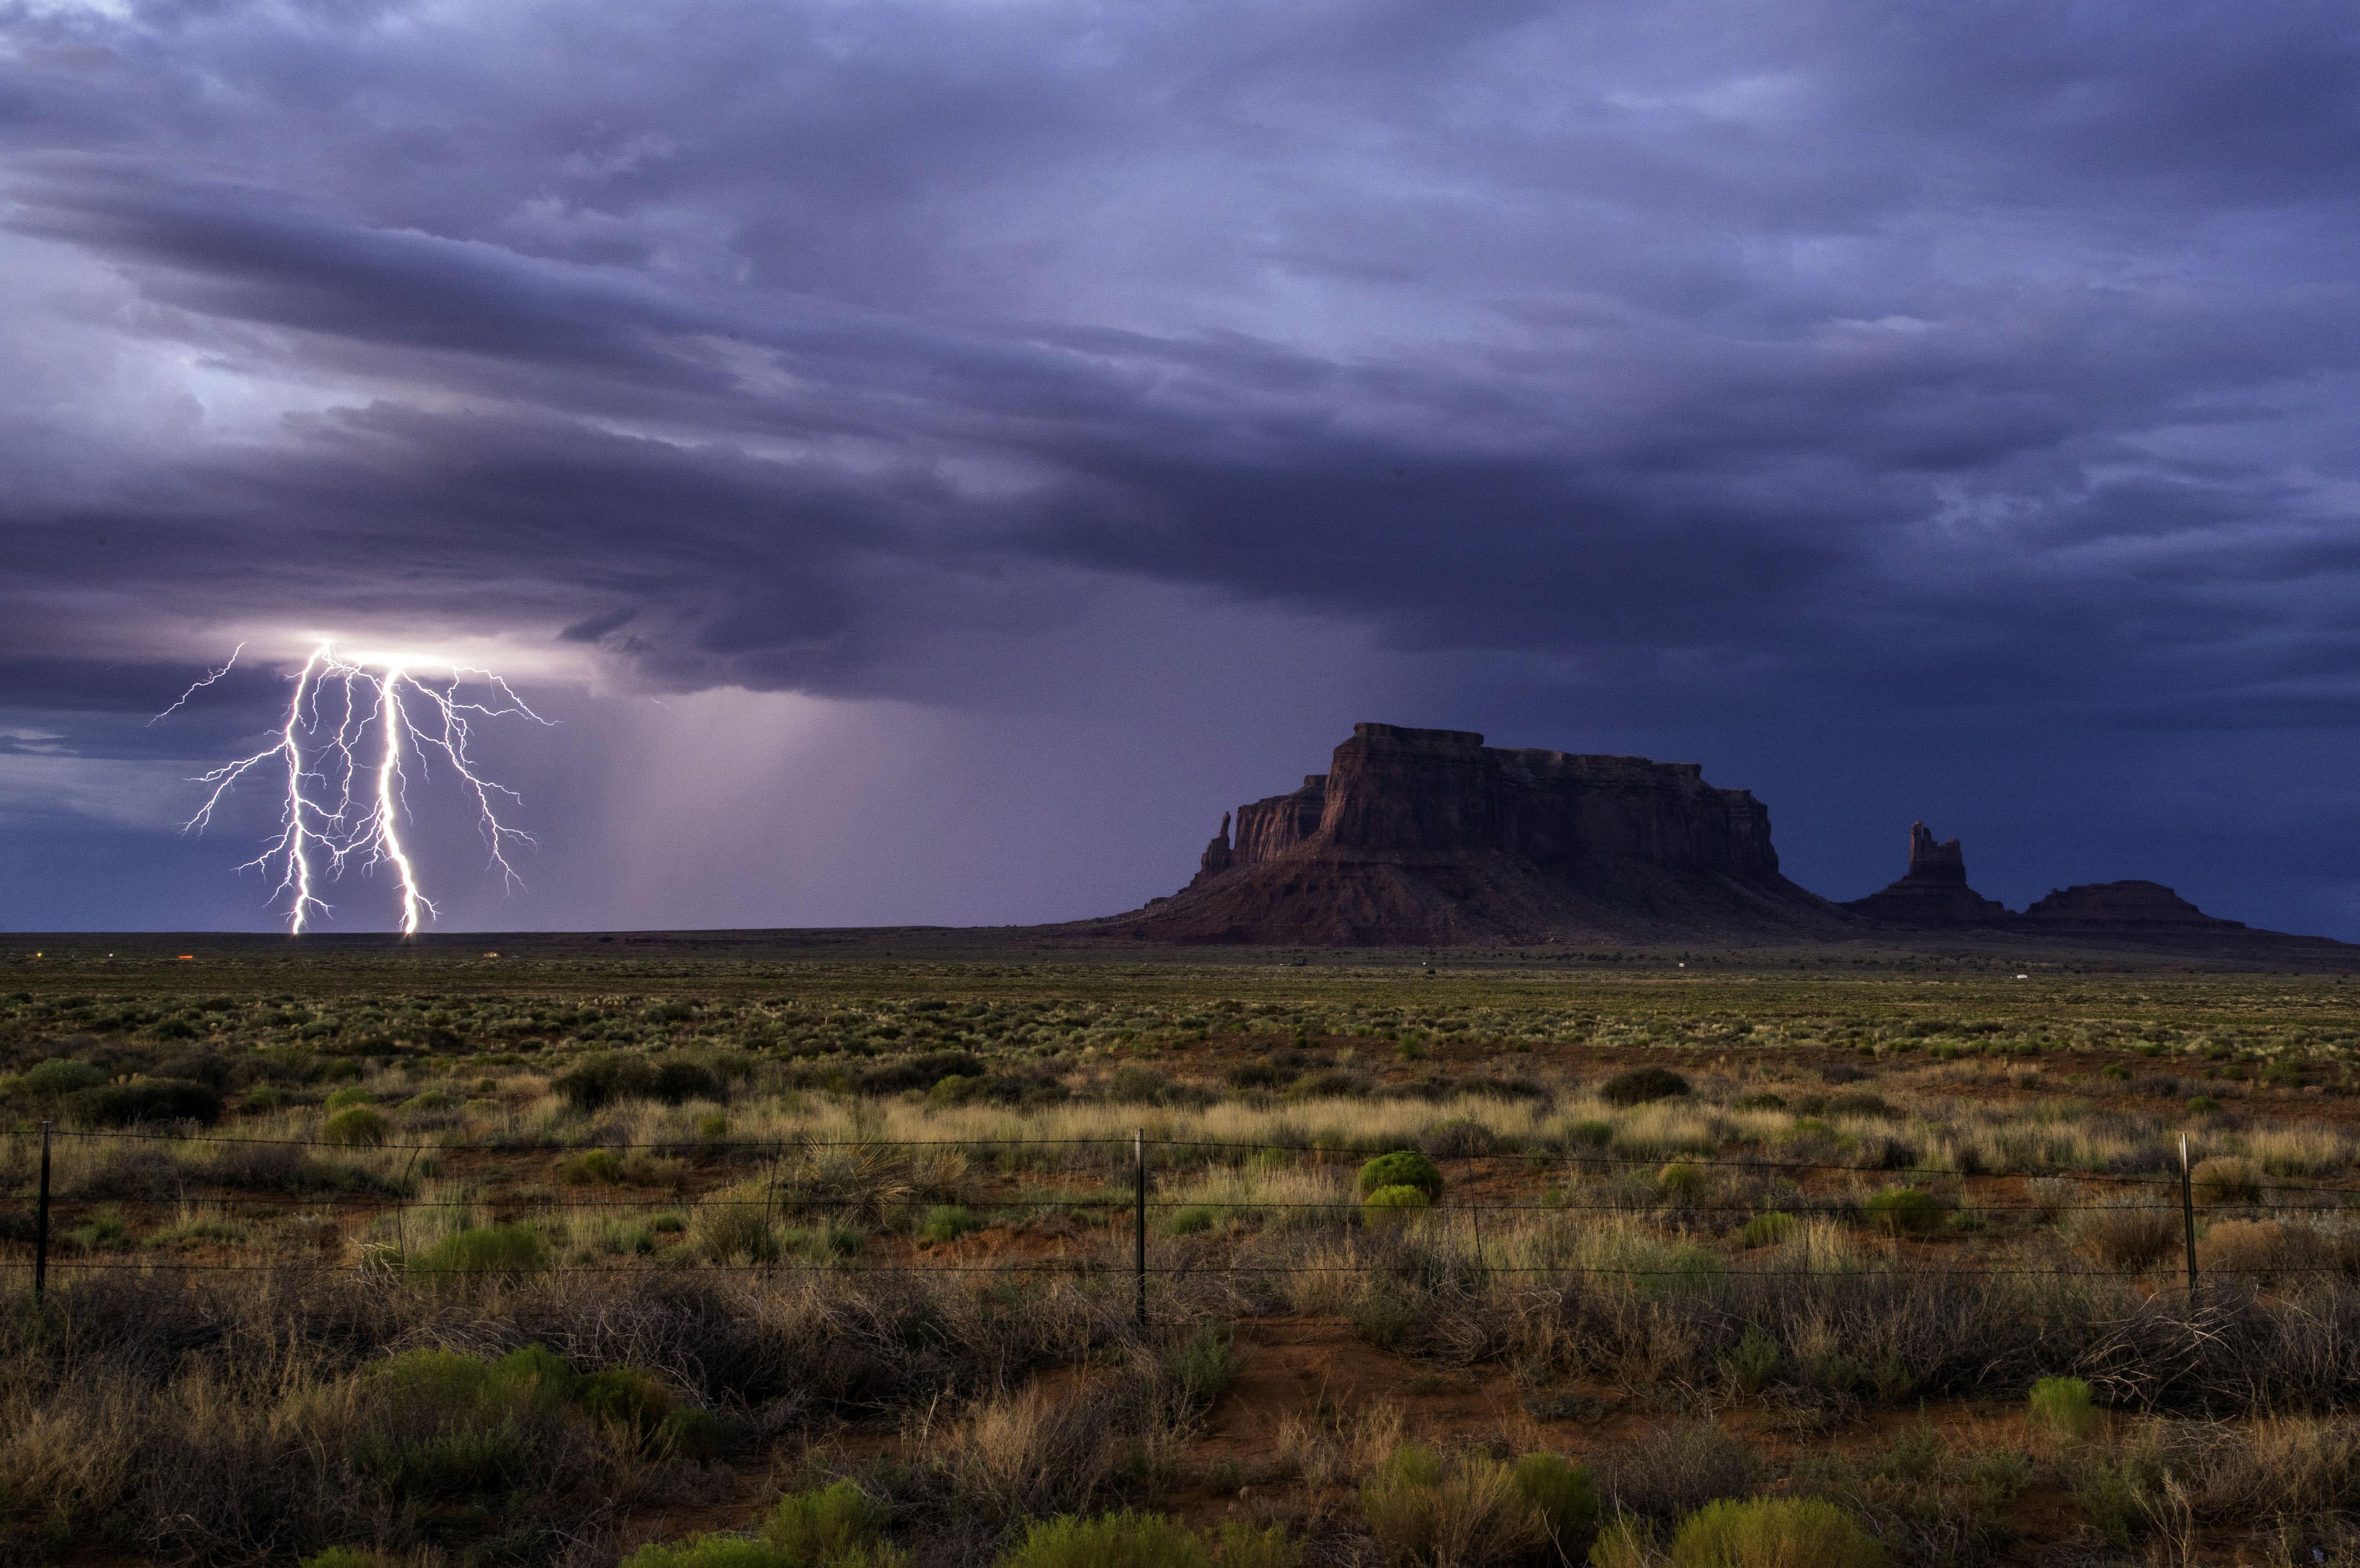 <p>Rain and lightning bolts hammer the desolate terrain of Monument Valley, Ariz. (Photo: Jennifer Khordi/Caters News) </p>